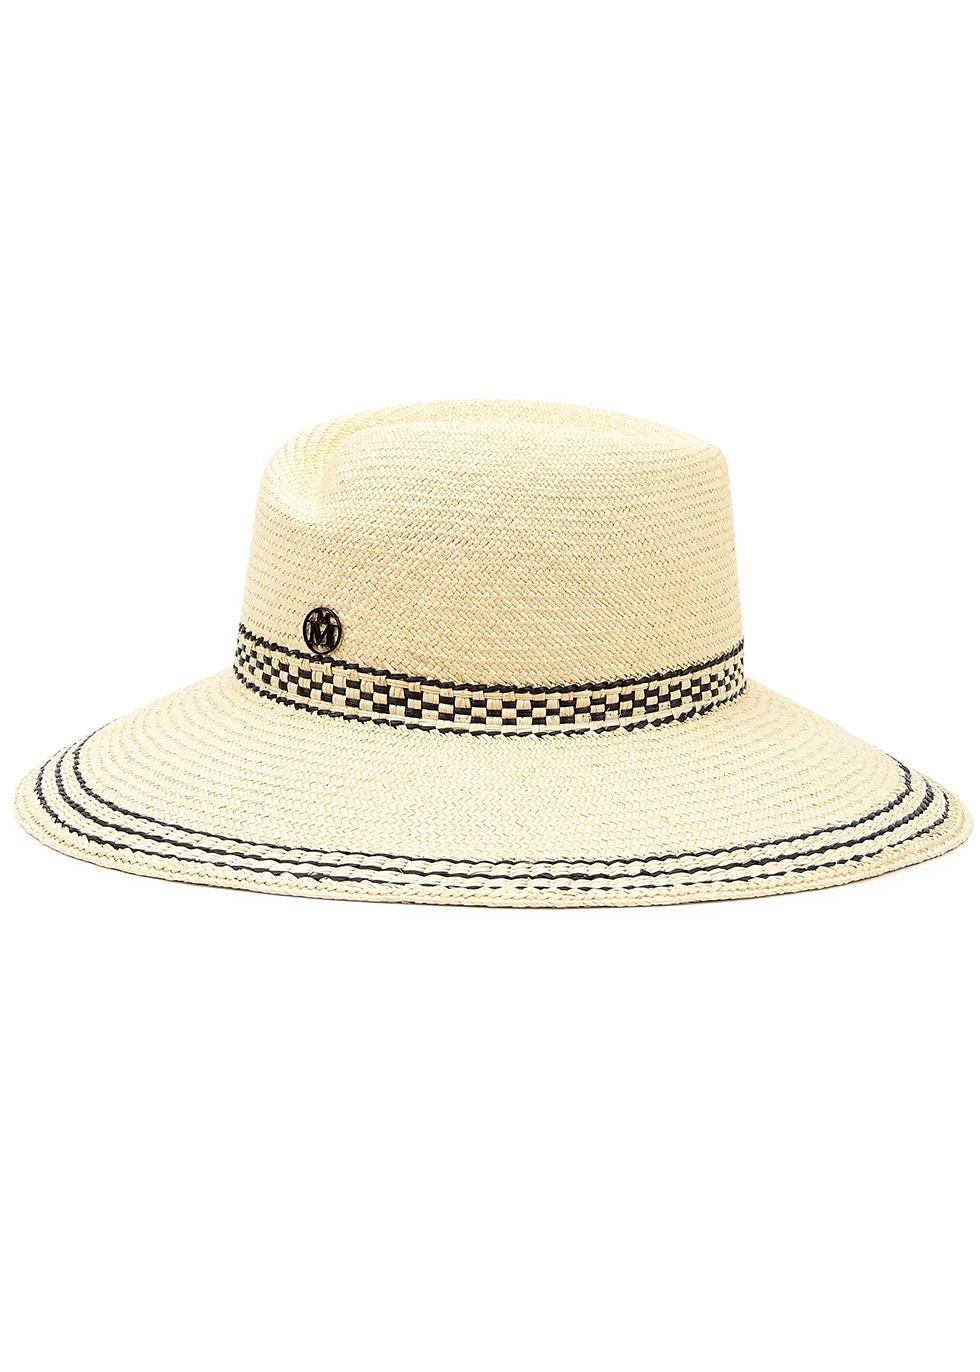 Virginie sand straw panama hat